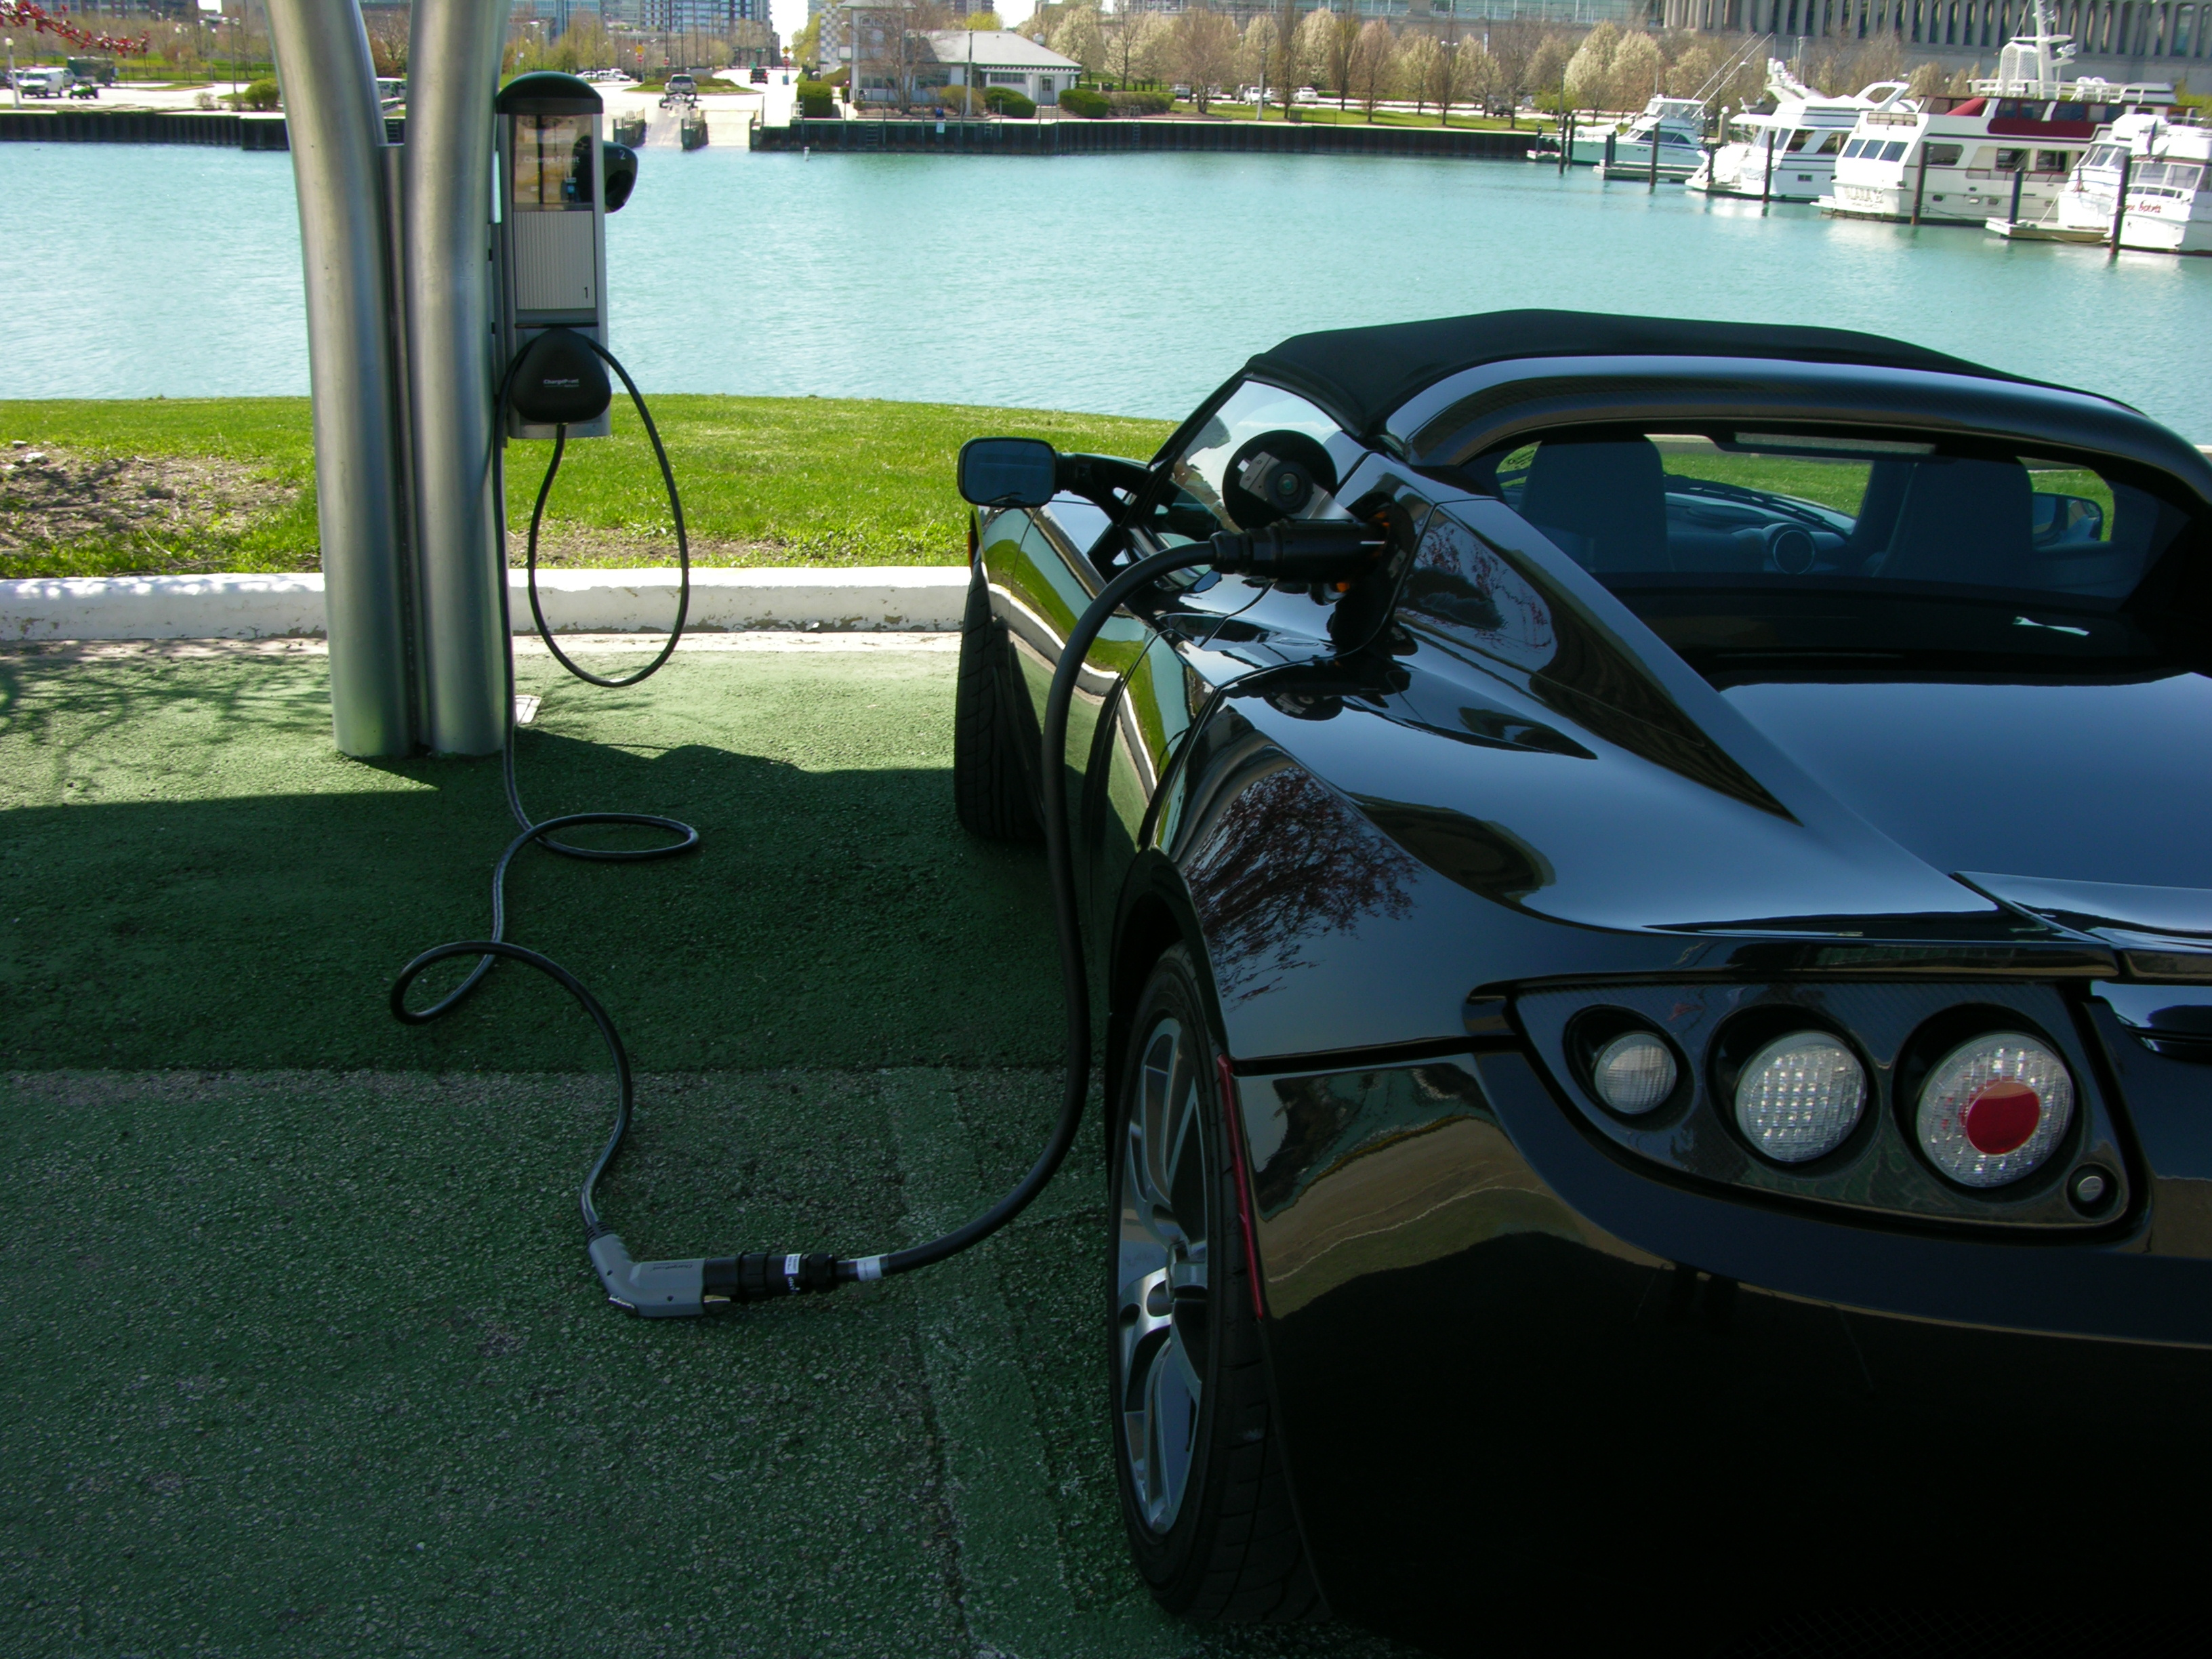 Solar EV Charge 001.JPG